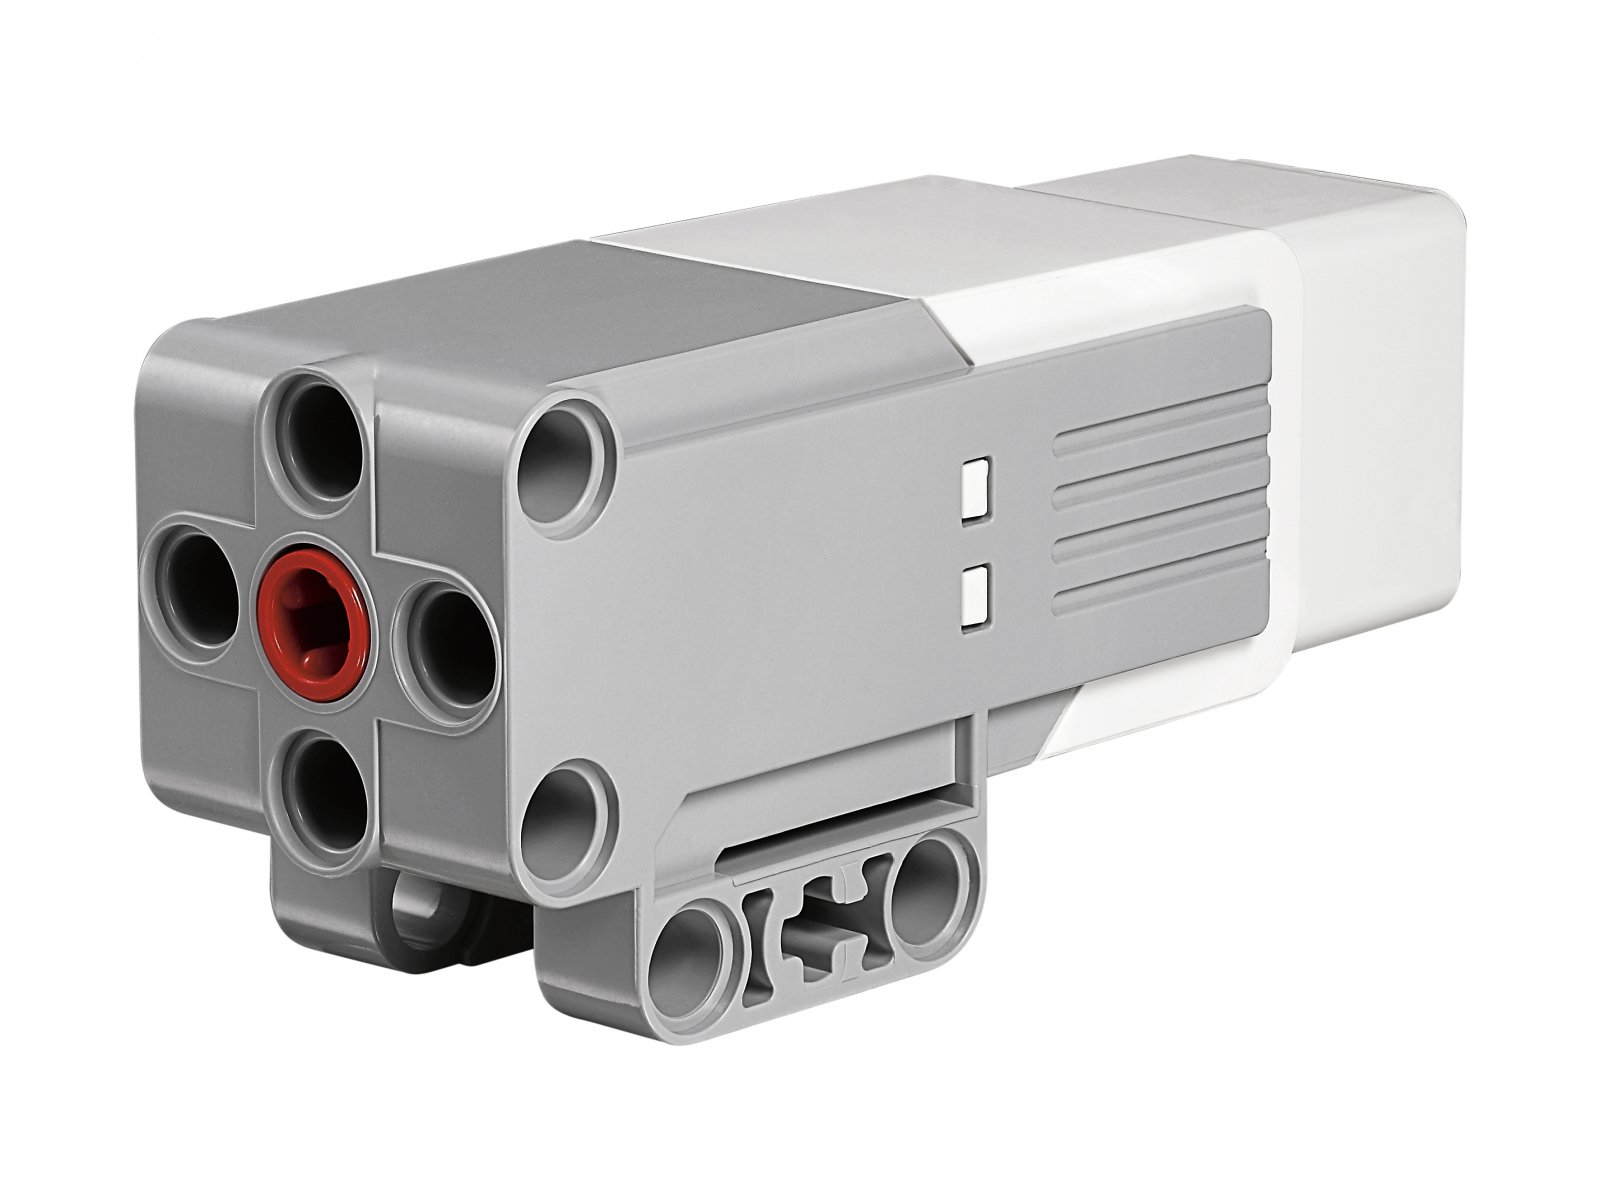 LEGO Mindstorms Średni serwomotor EV3 45503